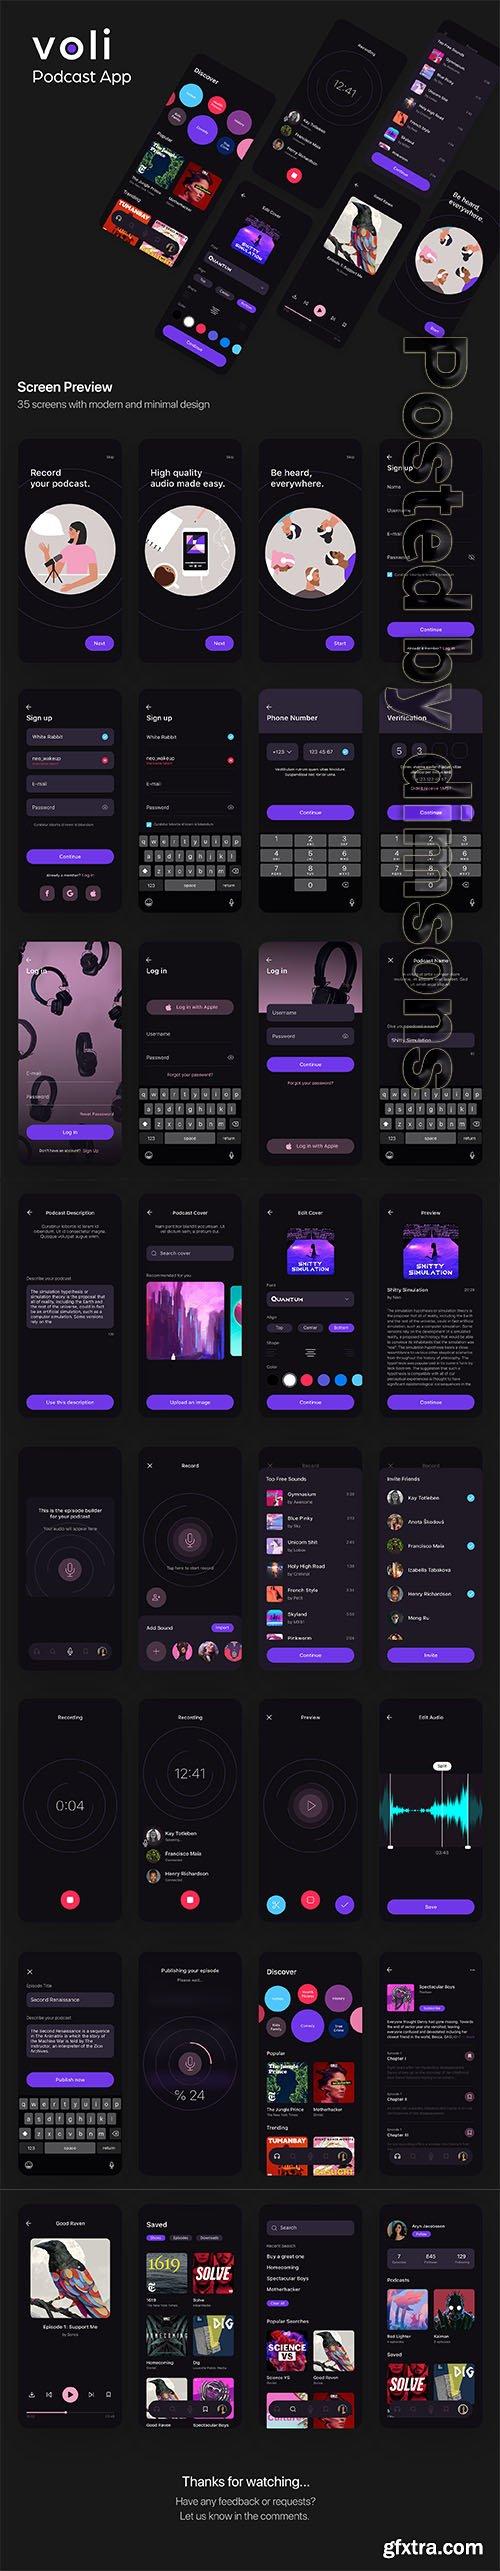 Voli Podcast App UI Kit